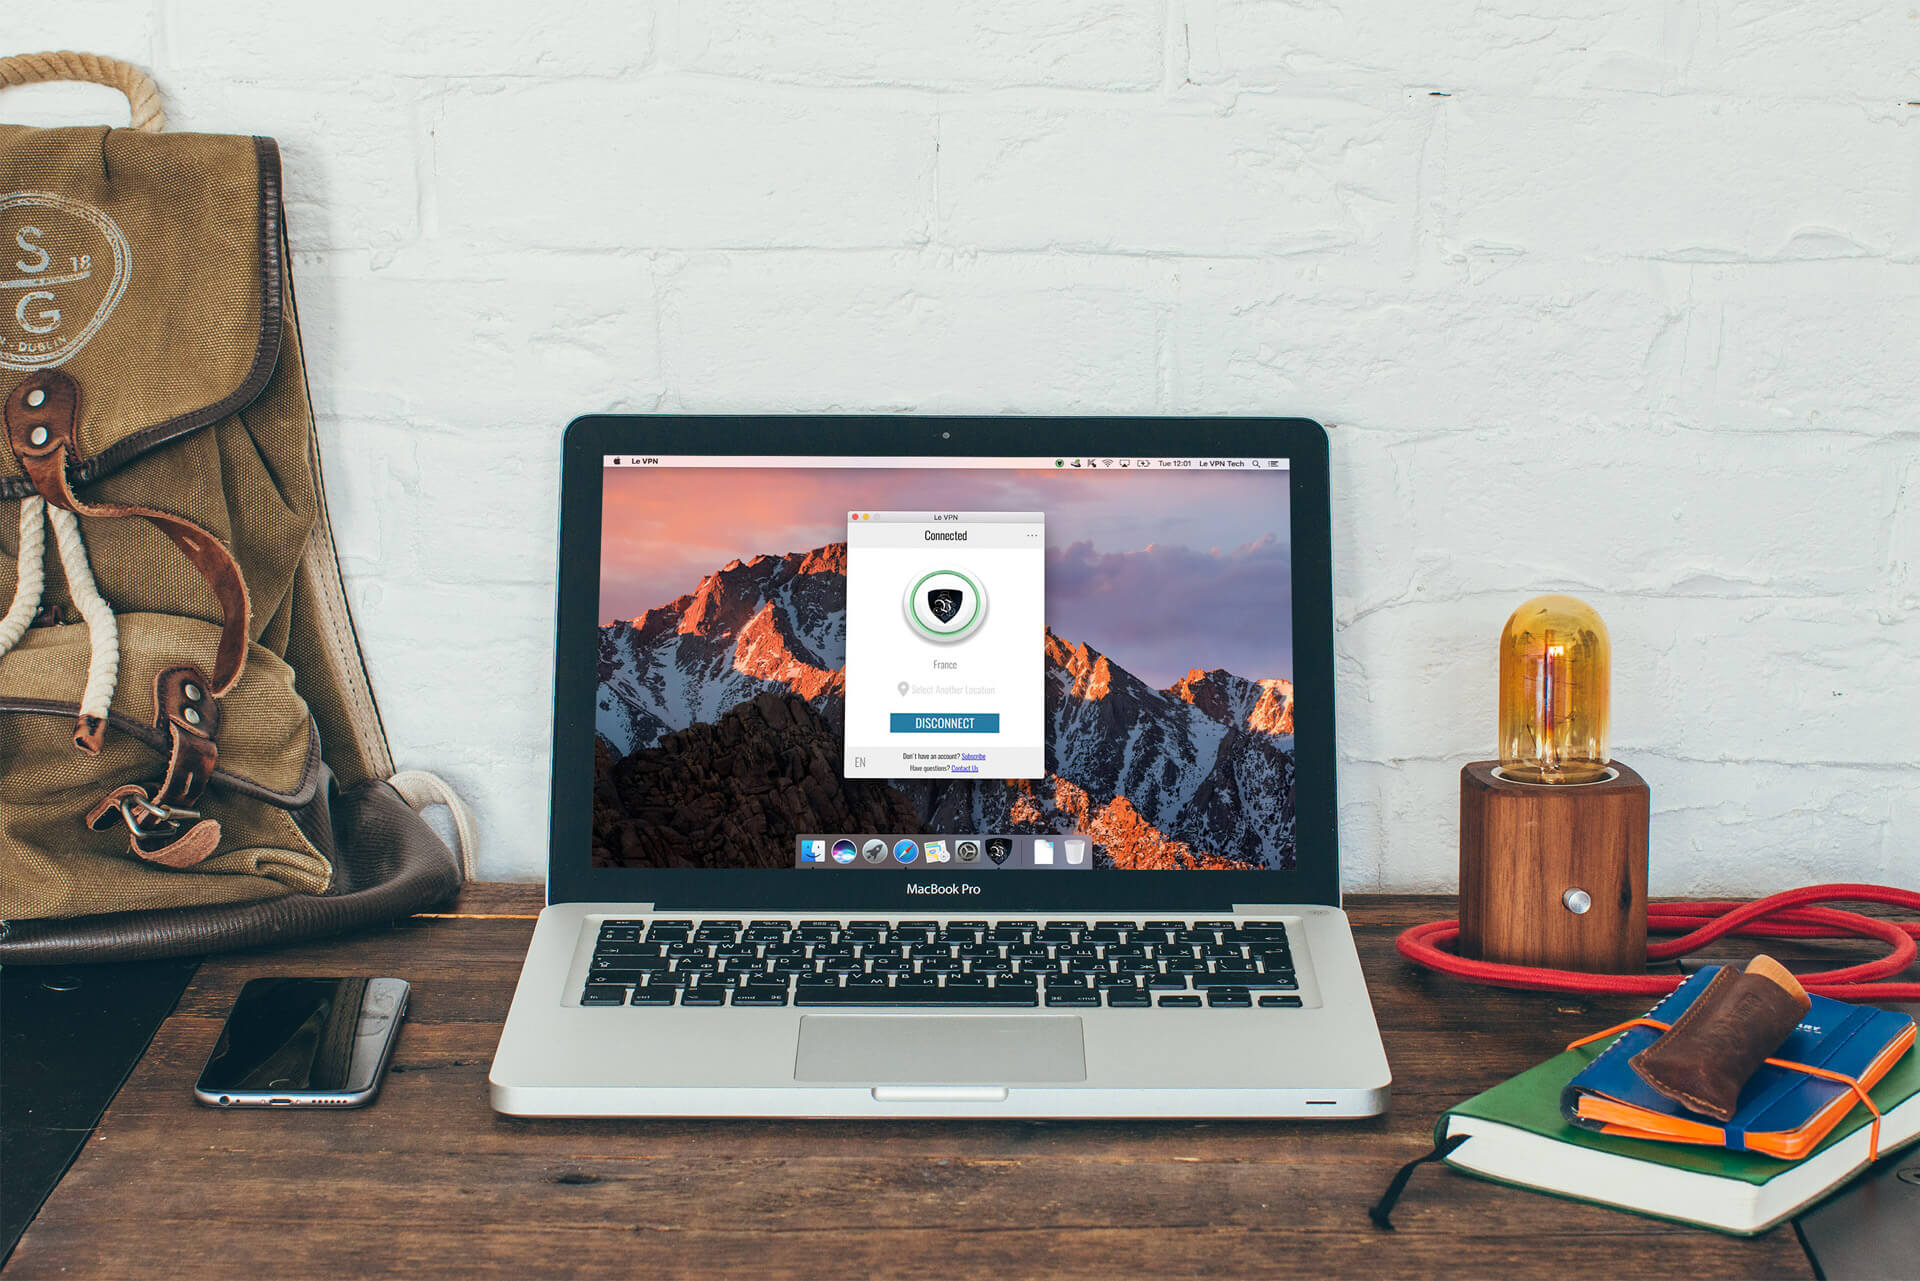 VPN протоколы — OpenVPN сервер